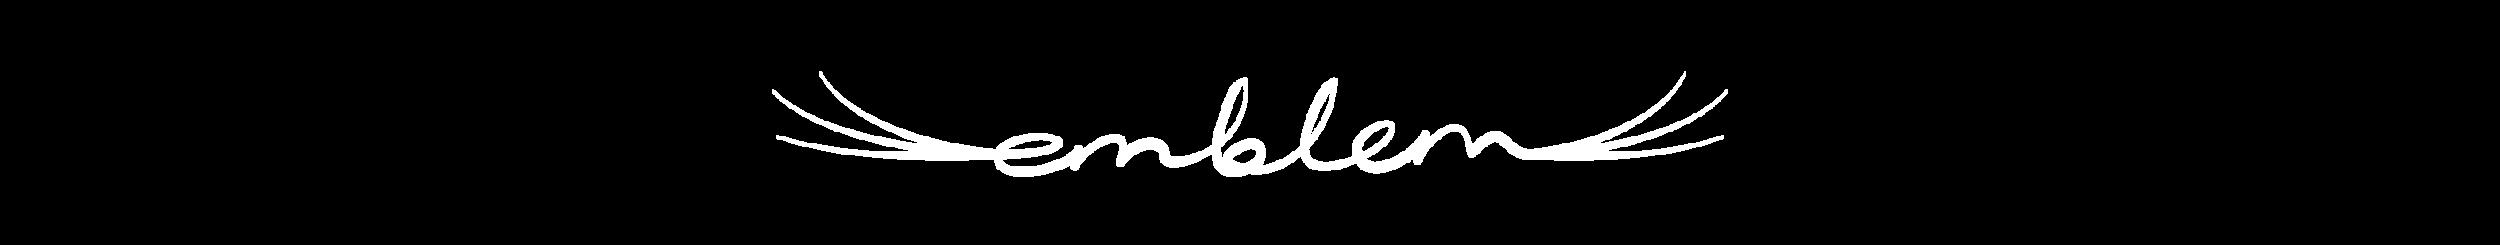 Emblem_nytt-02.png